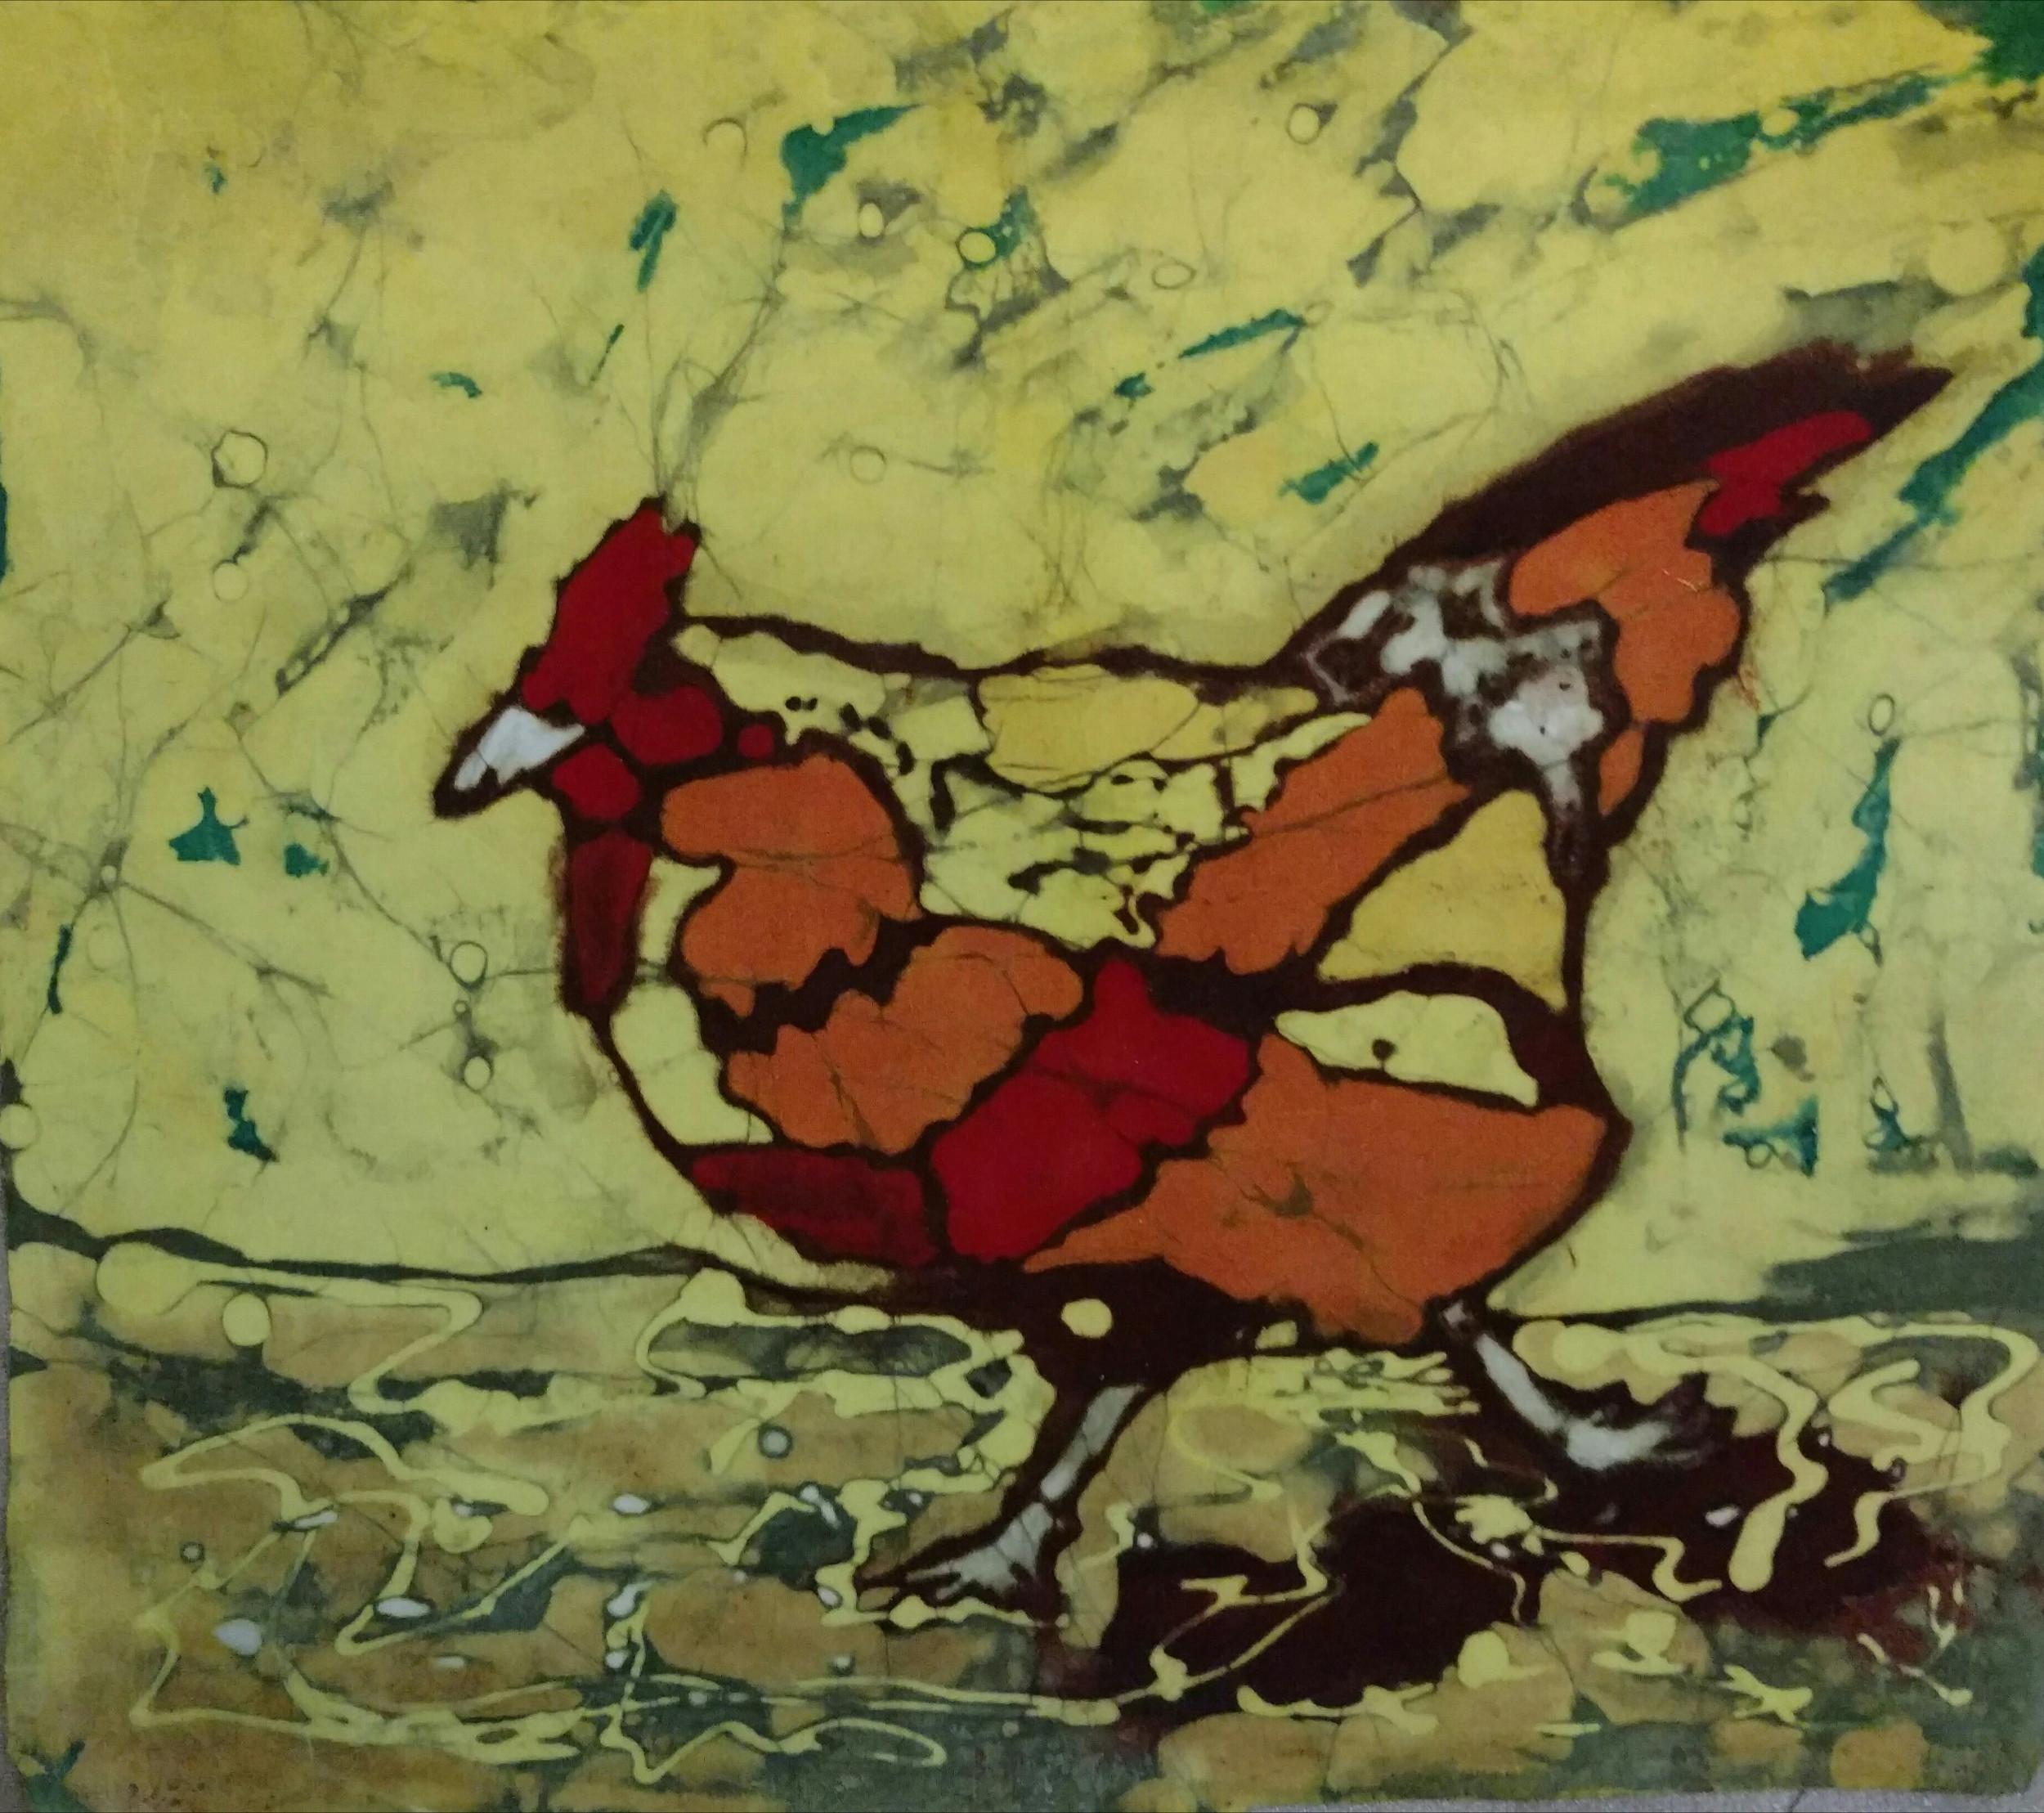 """Crossin' The Road"", batik, 16"" x 17"", $275 (framed)"